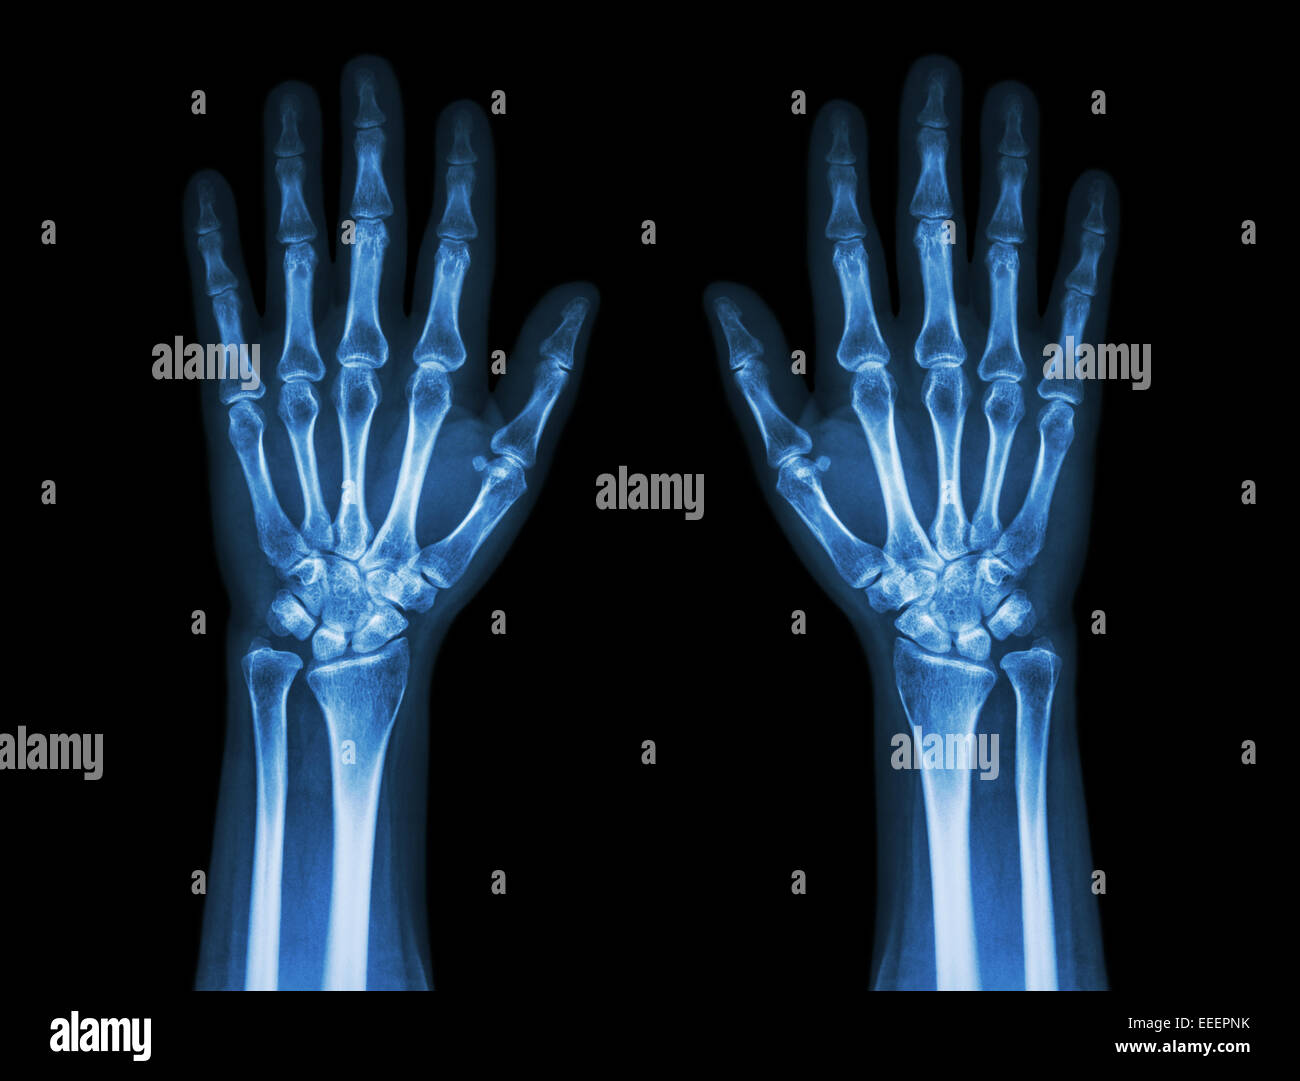 Human Wrist Anatomy Xray View Stock Photos & Human Wrist Anatomy ...